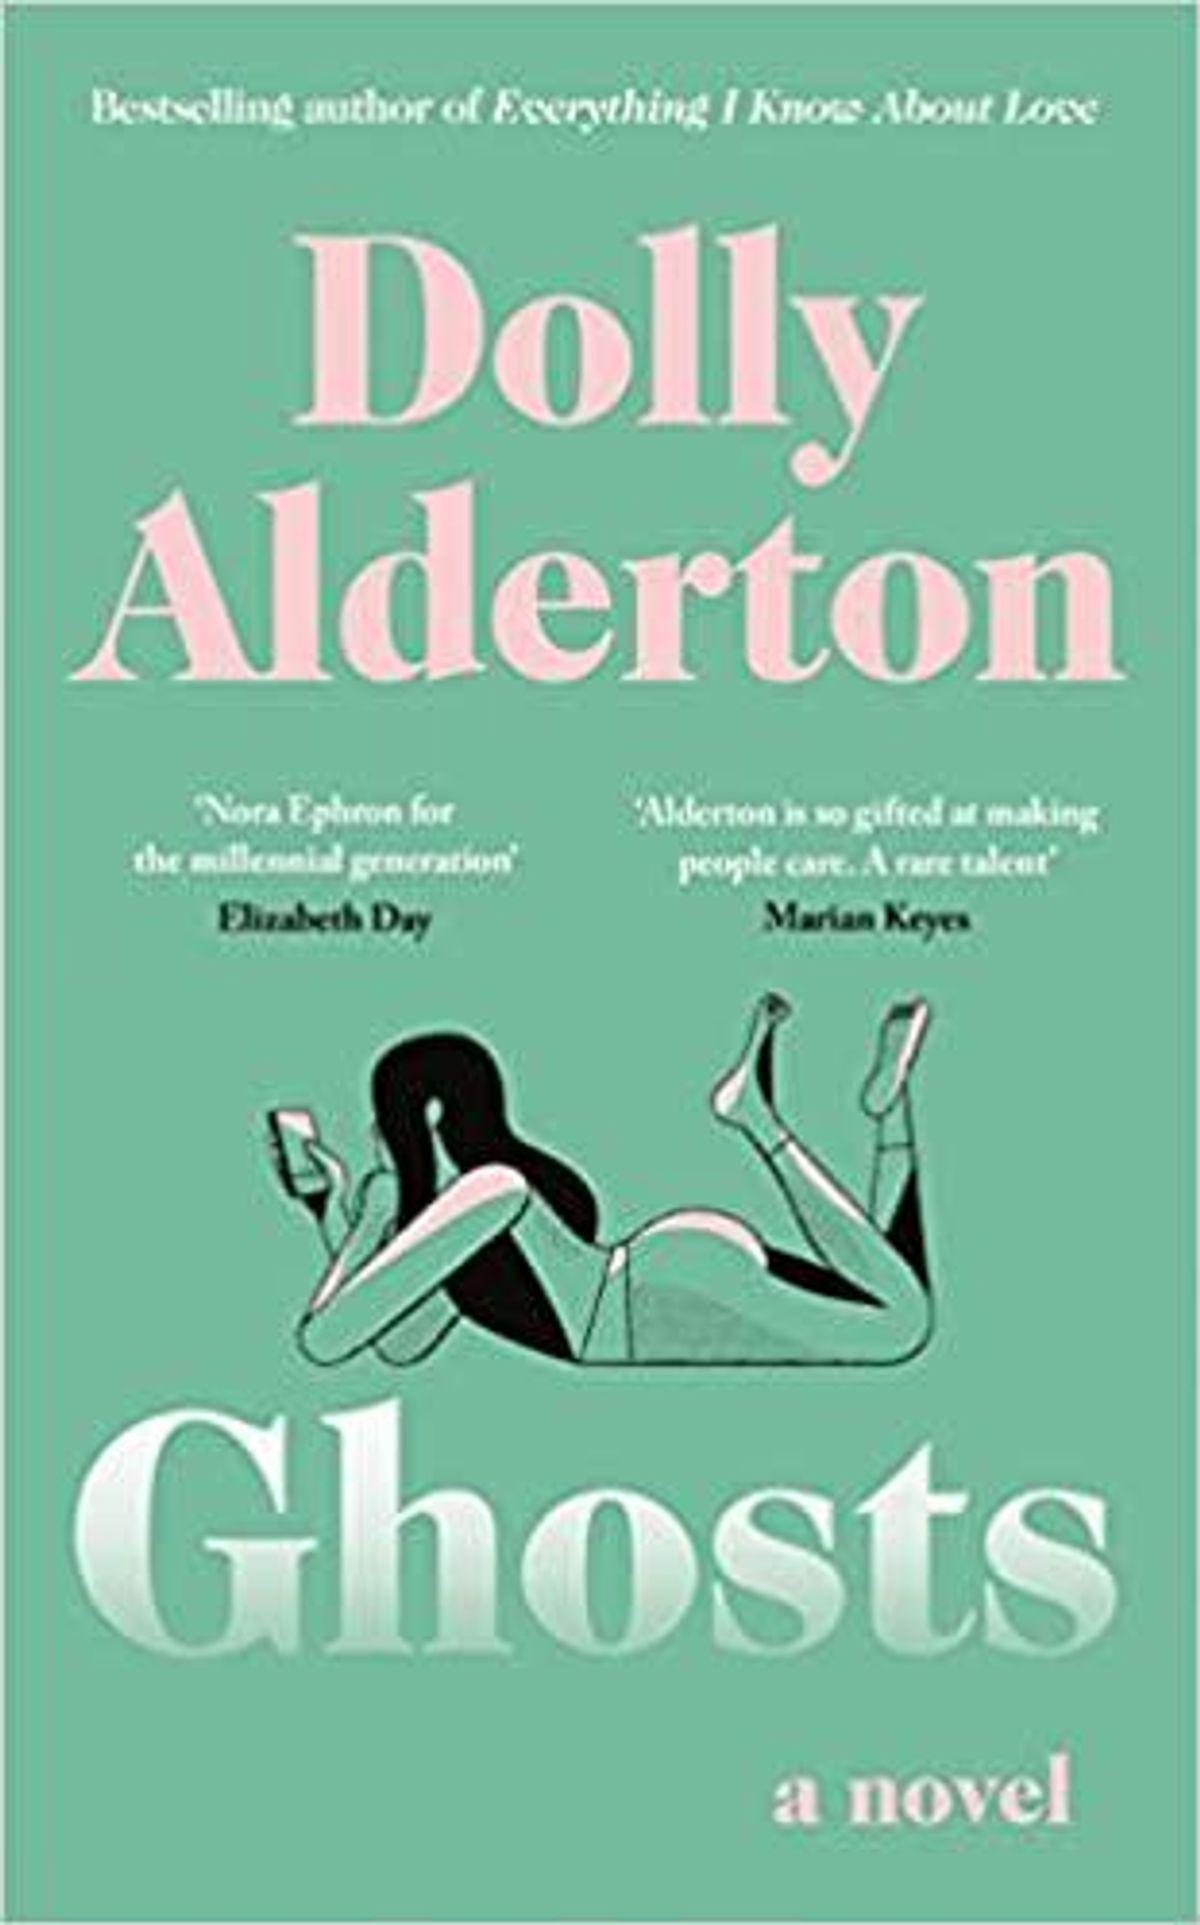 Ghosts: A Novel by Dolly Alderton